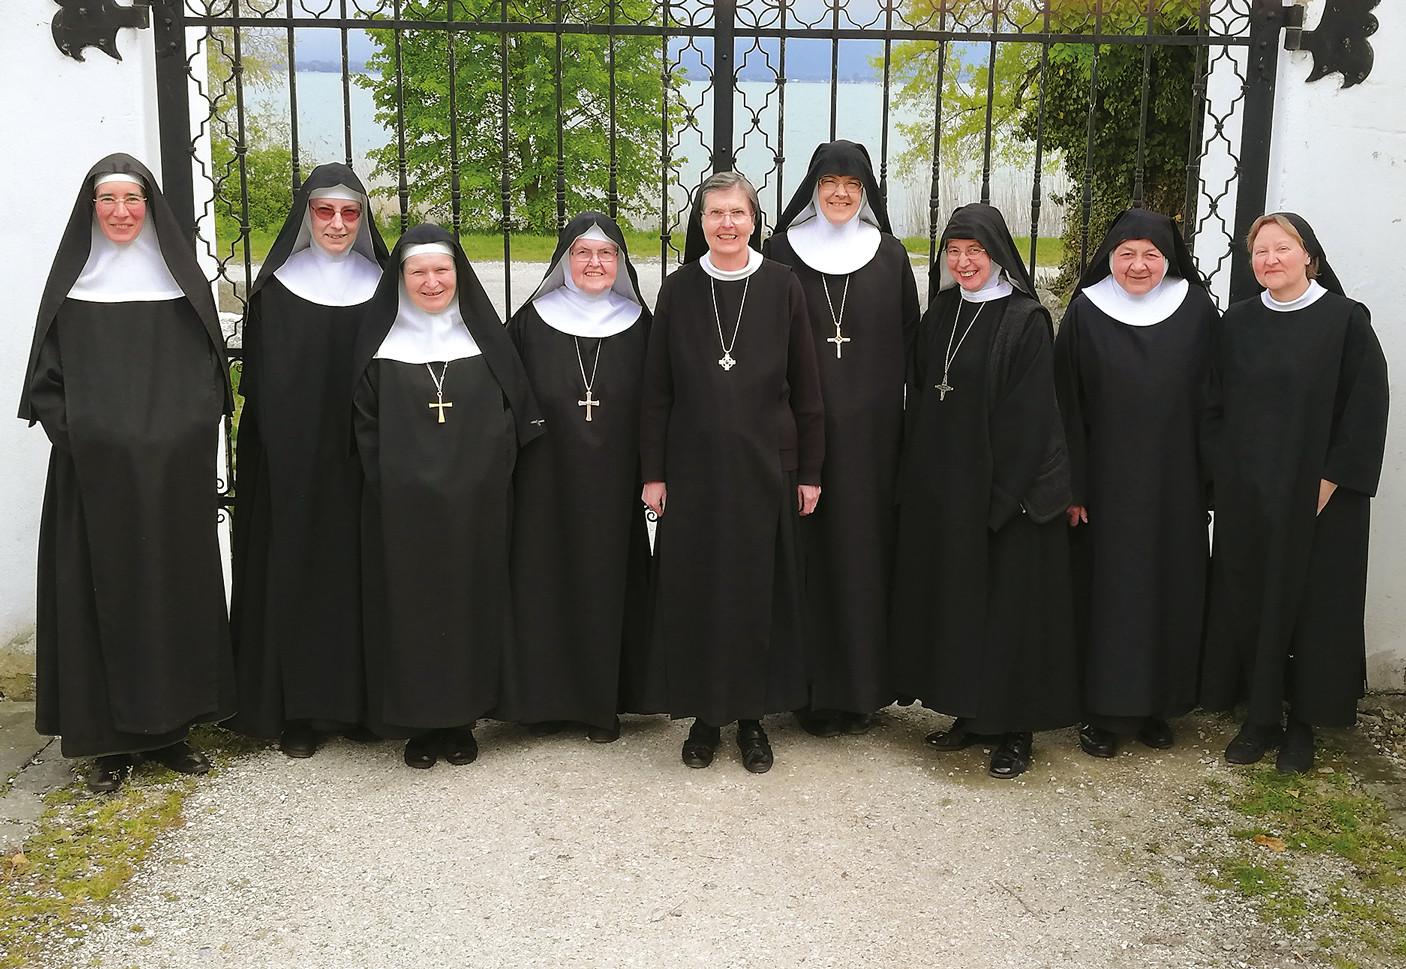 Föderationskapitel tagte in unserer Abtei